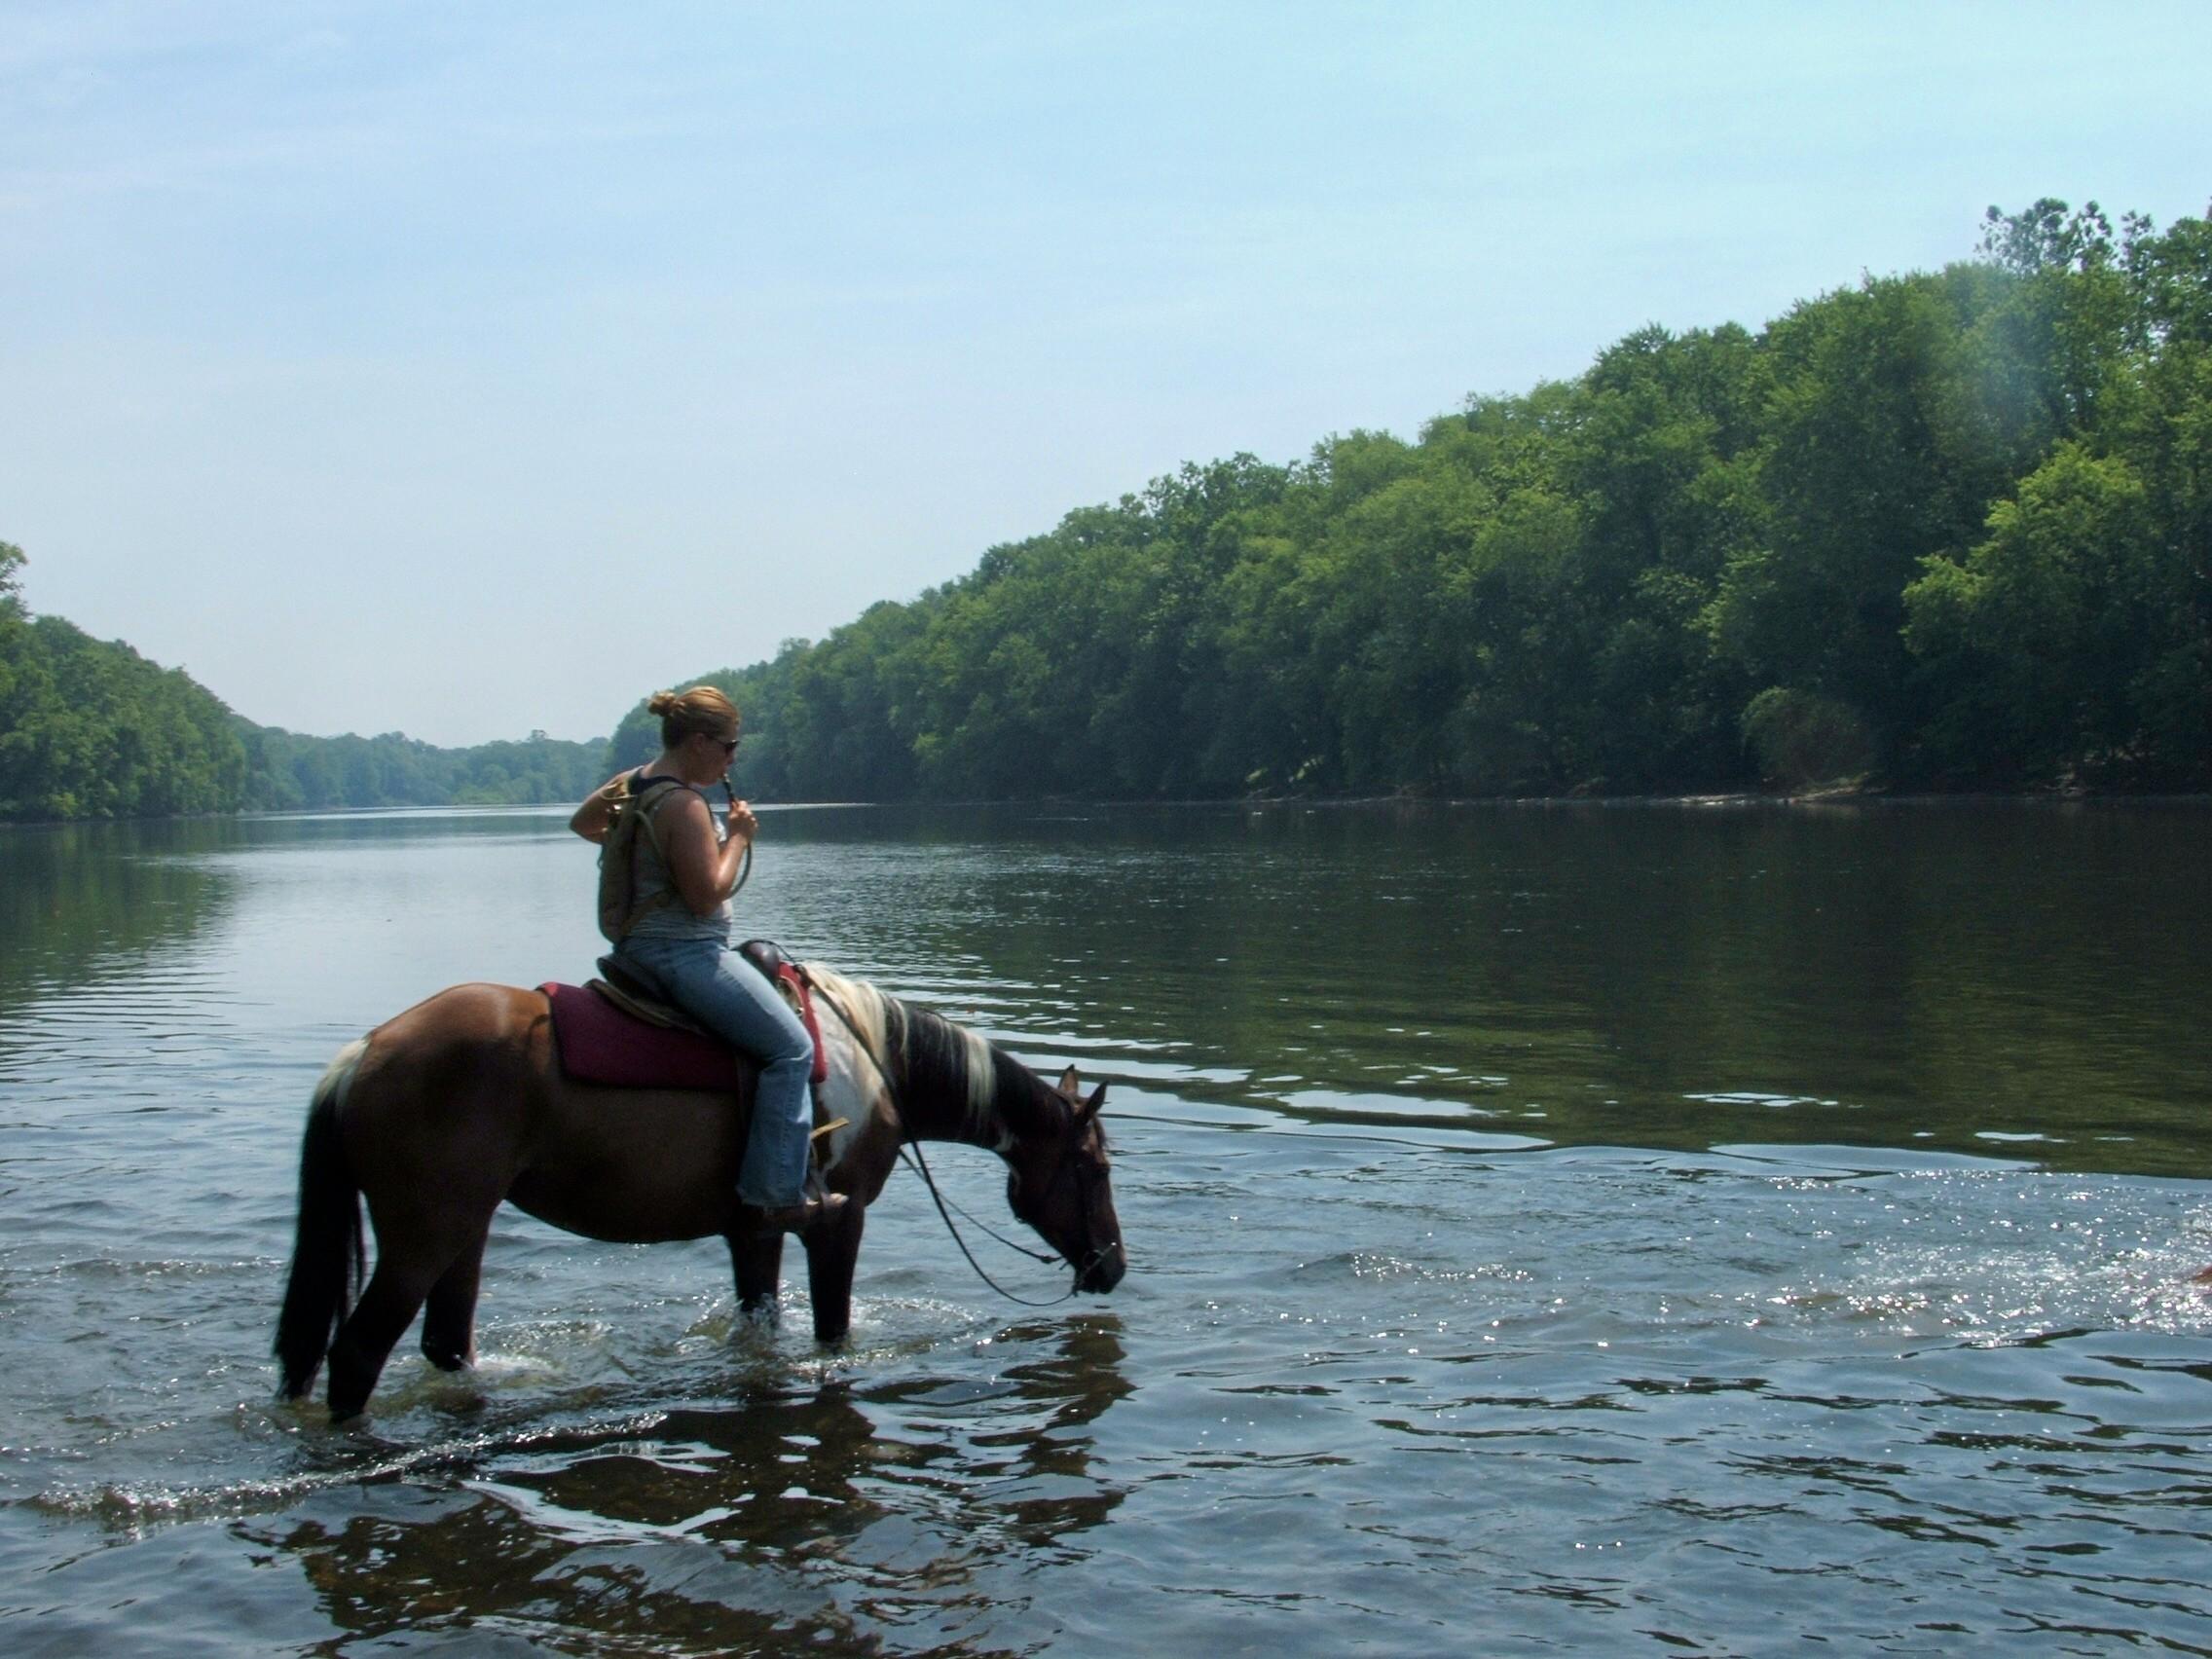 Sheeder Mill Farm Horses For Sale in Pennsylvania